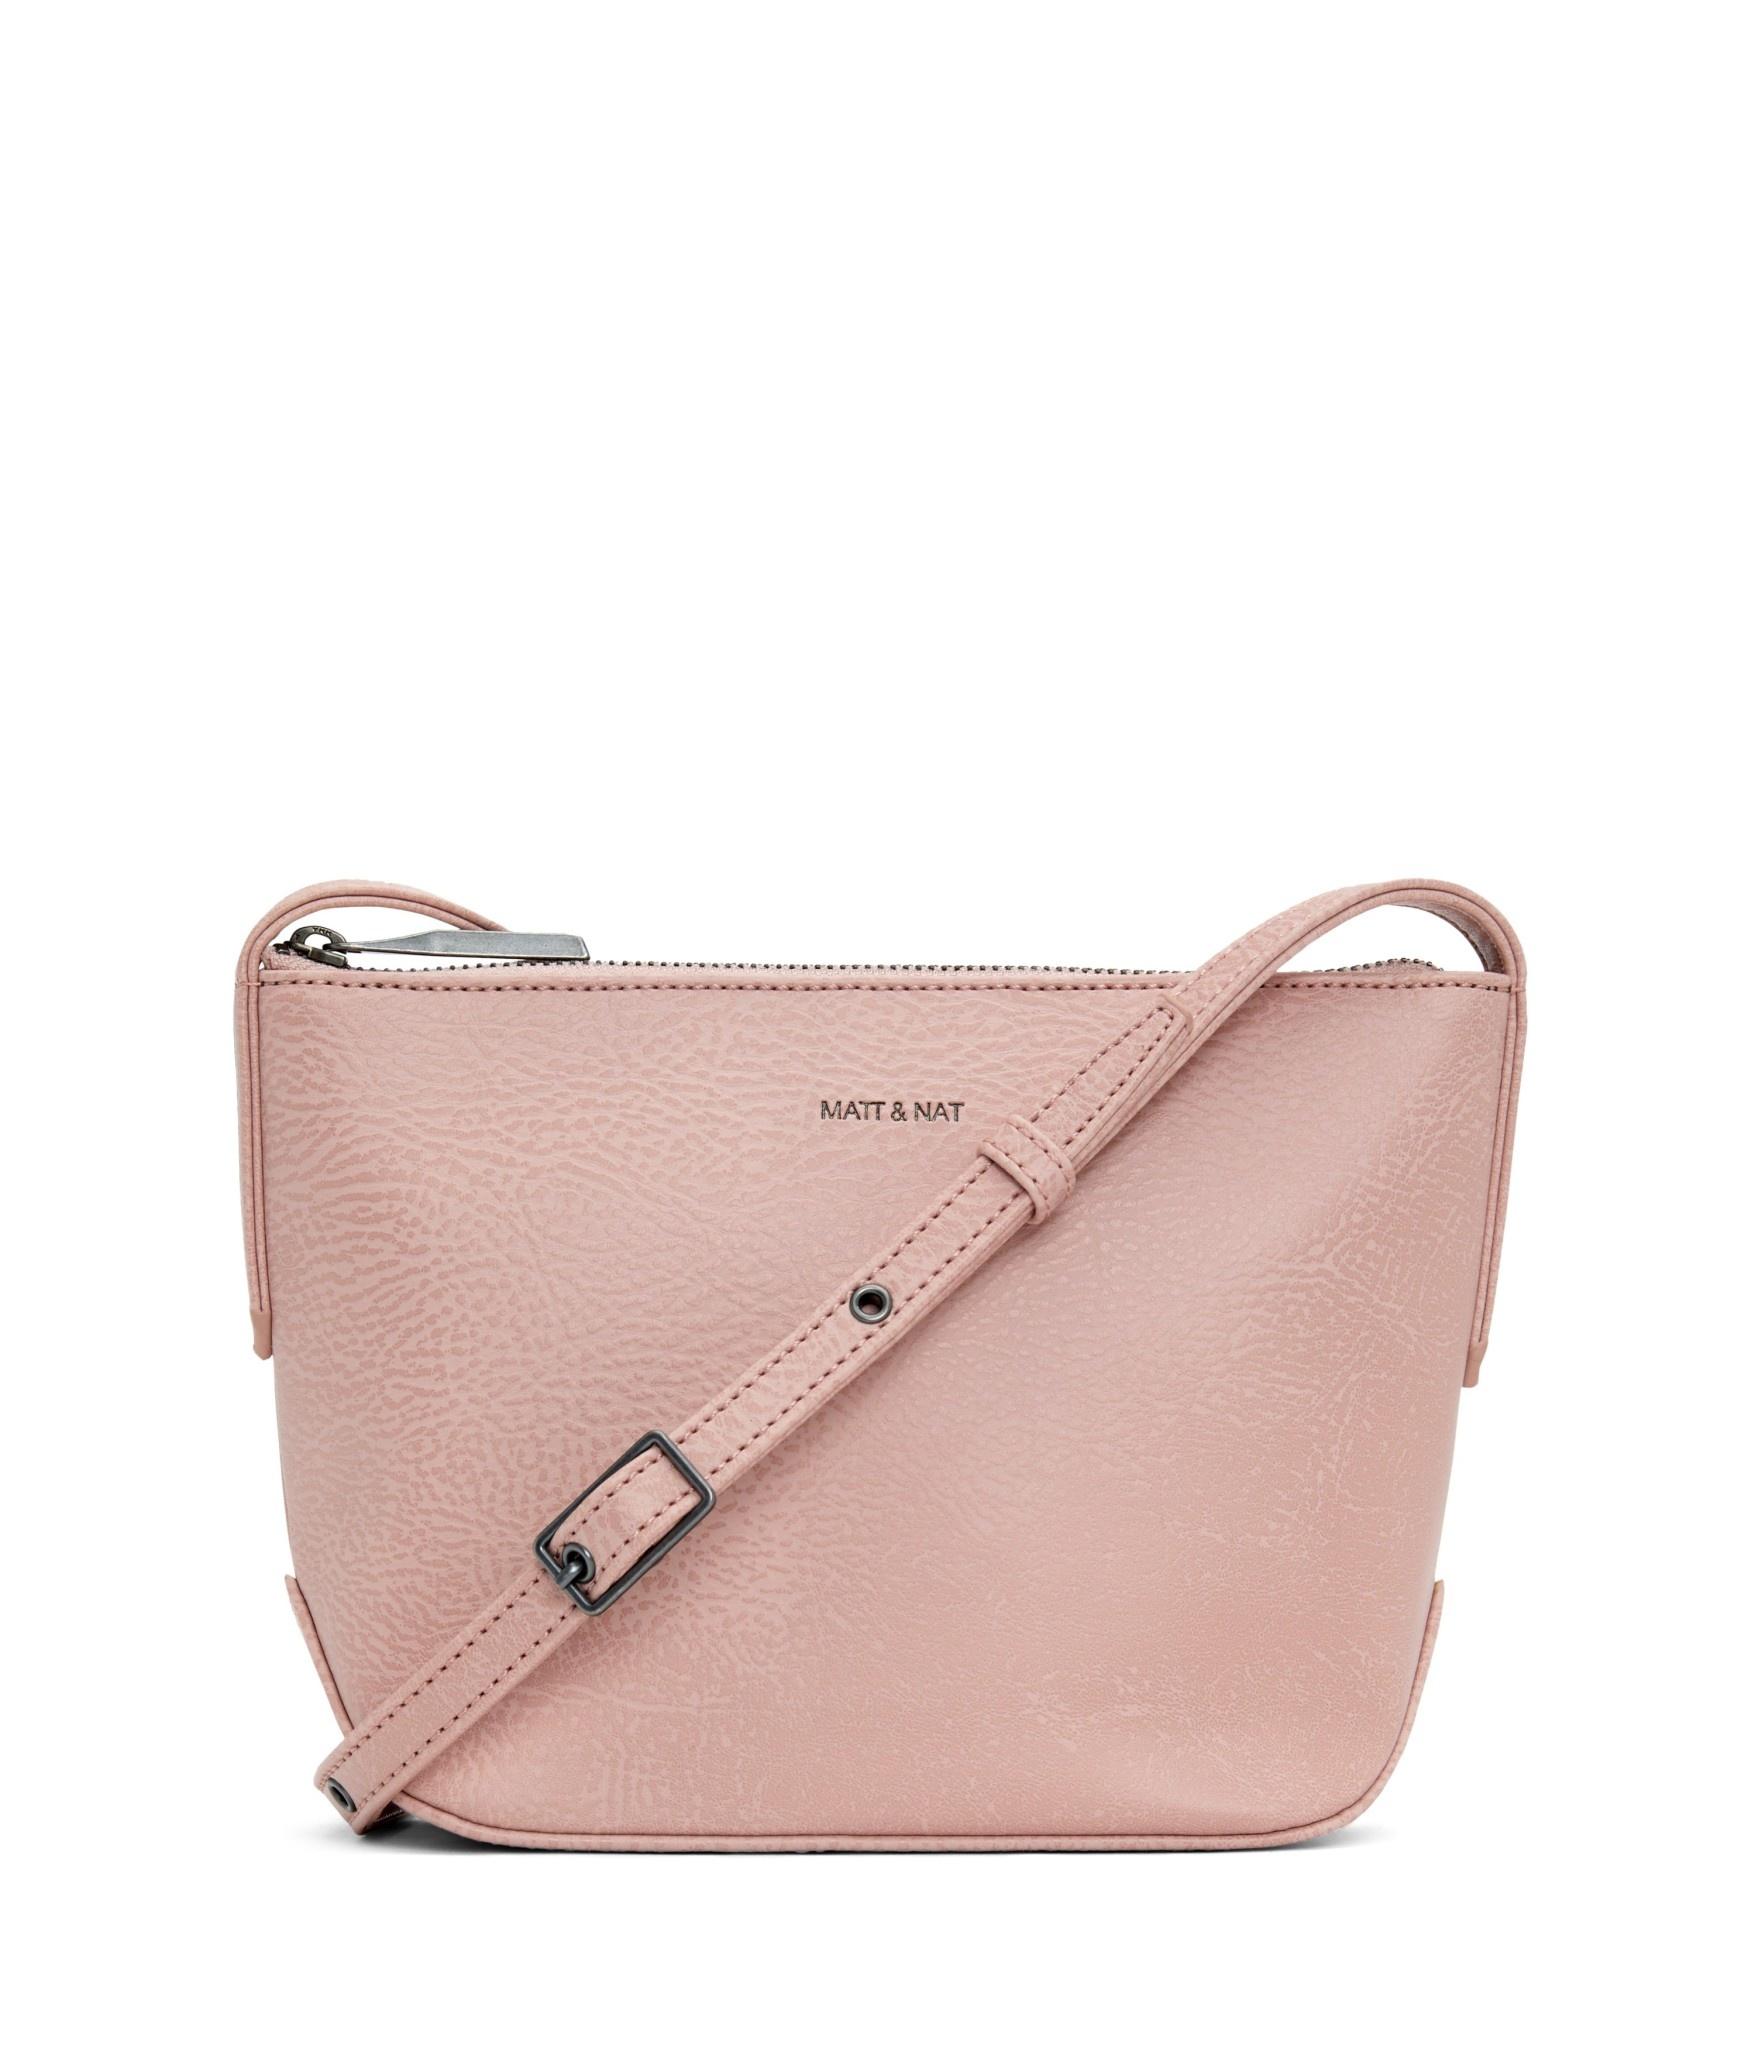 Sam Crossbody Bag Pebble Pink-1